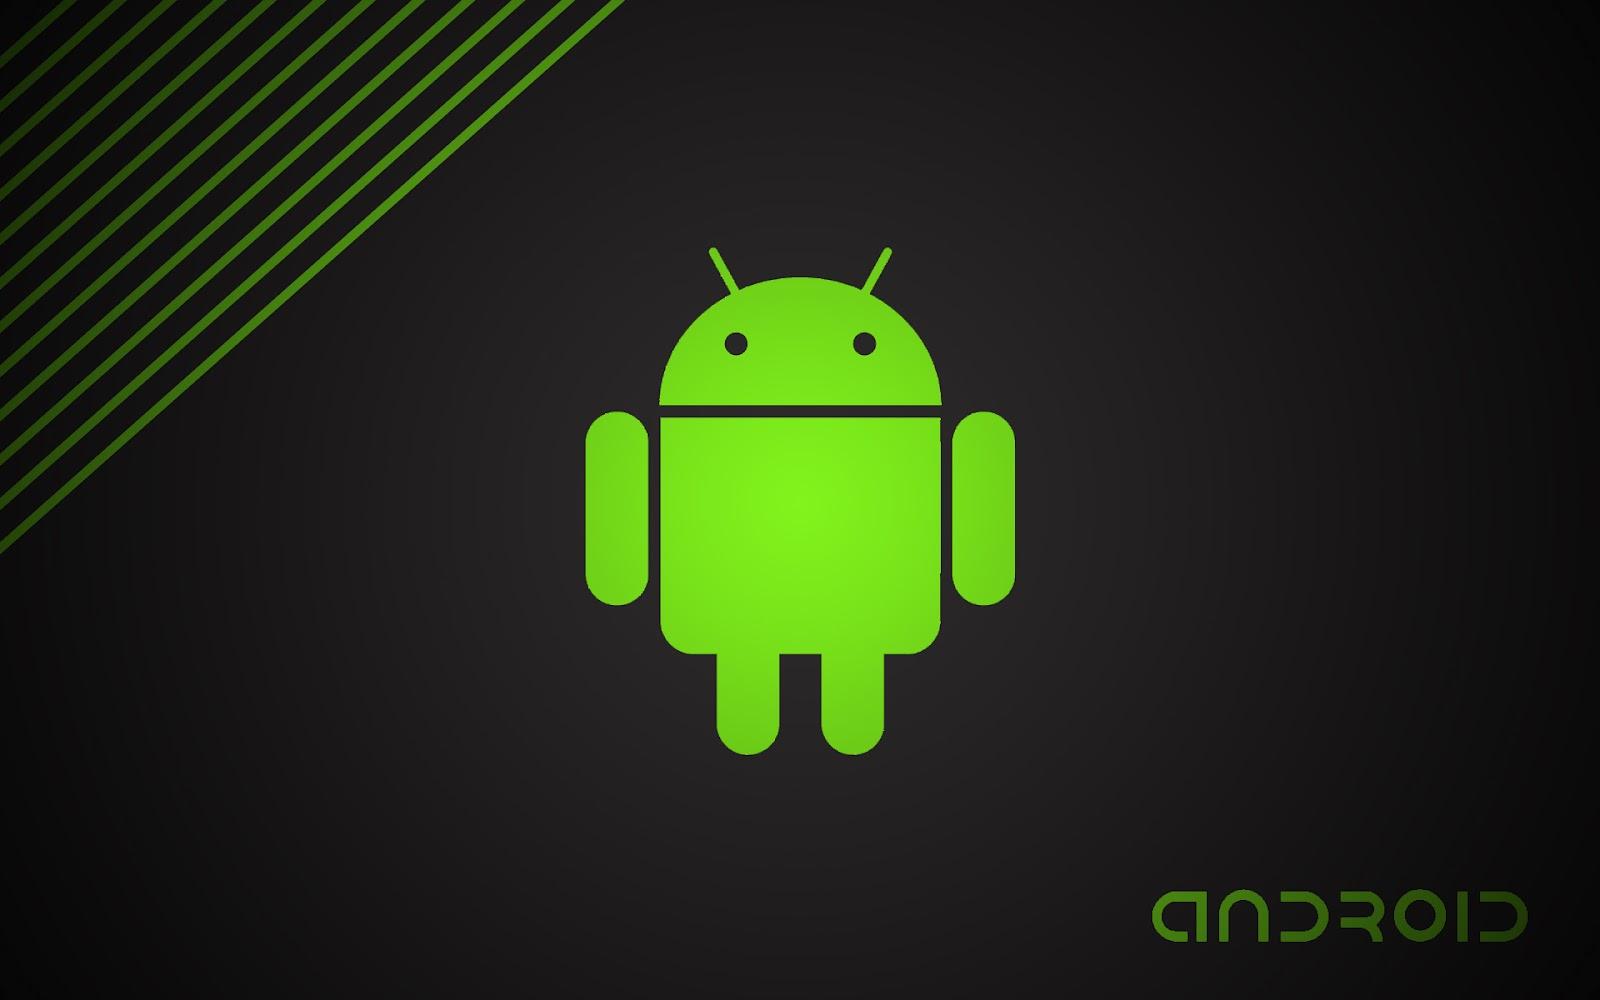 http://4.bp.blogspot.com/-EFprQxk6DAs/T-yFl00cezI/AAAAAAAAAhw/JgUJlJhiAkE/s1600/android+HD+Wallpaper+hd+(8).jpg